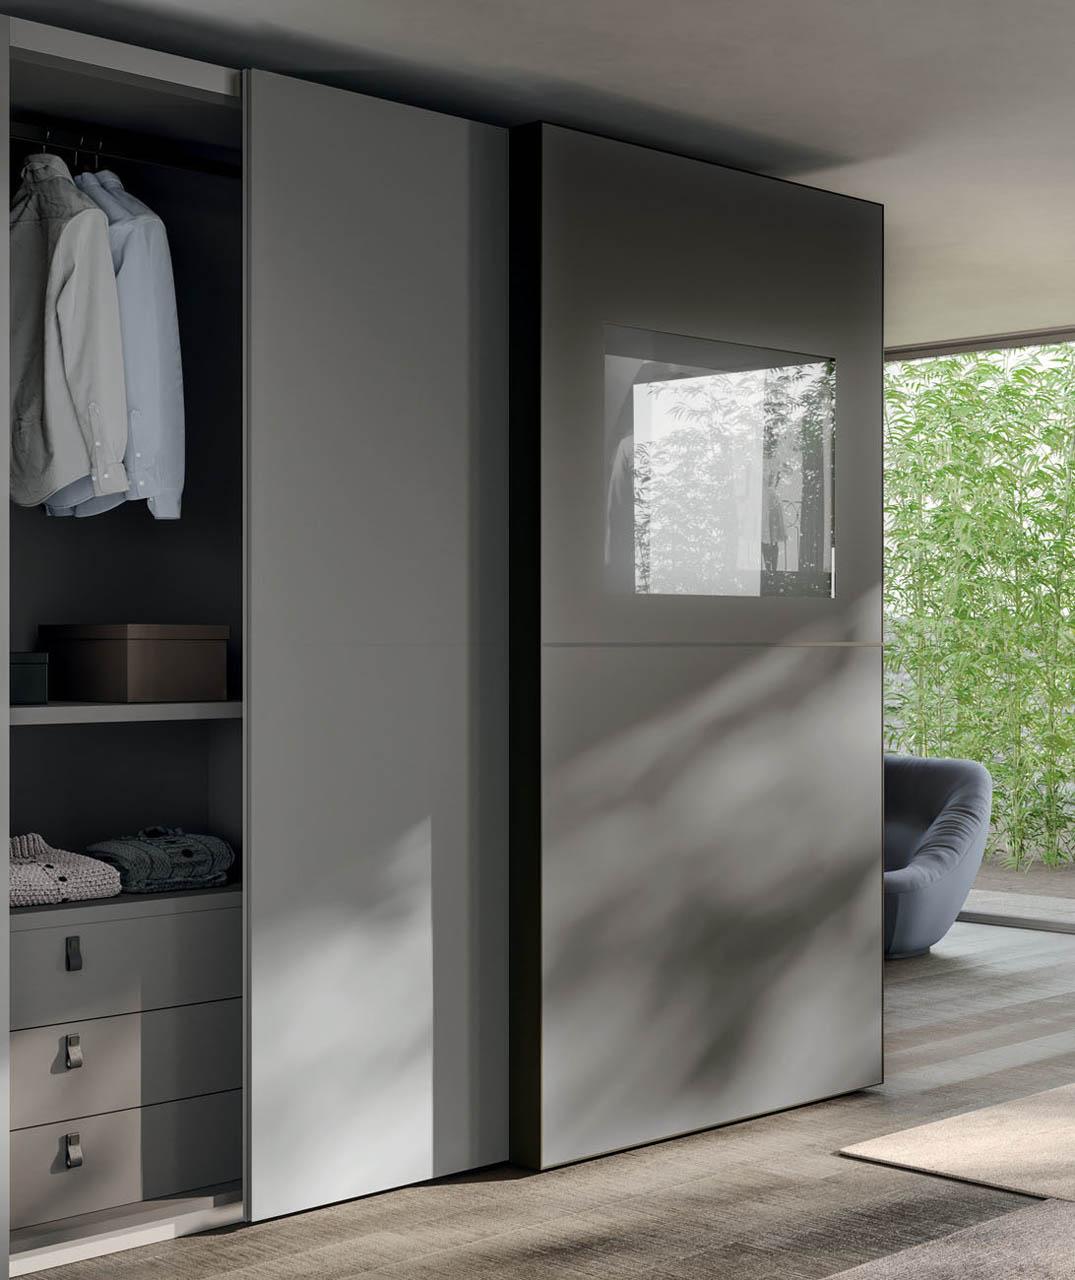 armadio-scorrevole-anta-vista-2-orme-1092x1300